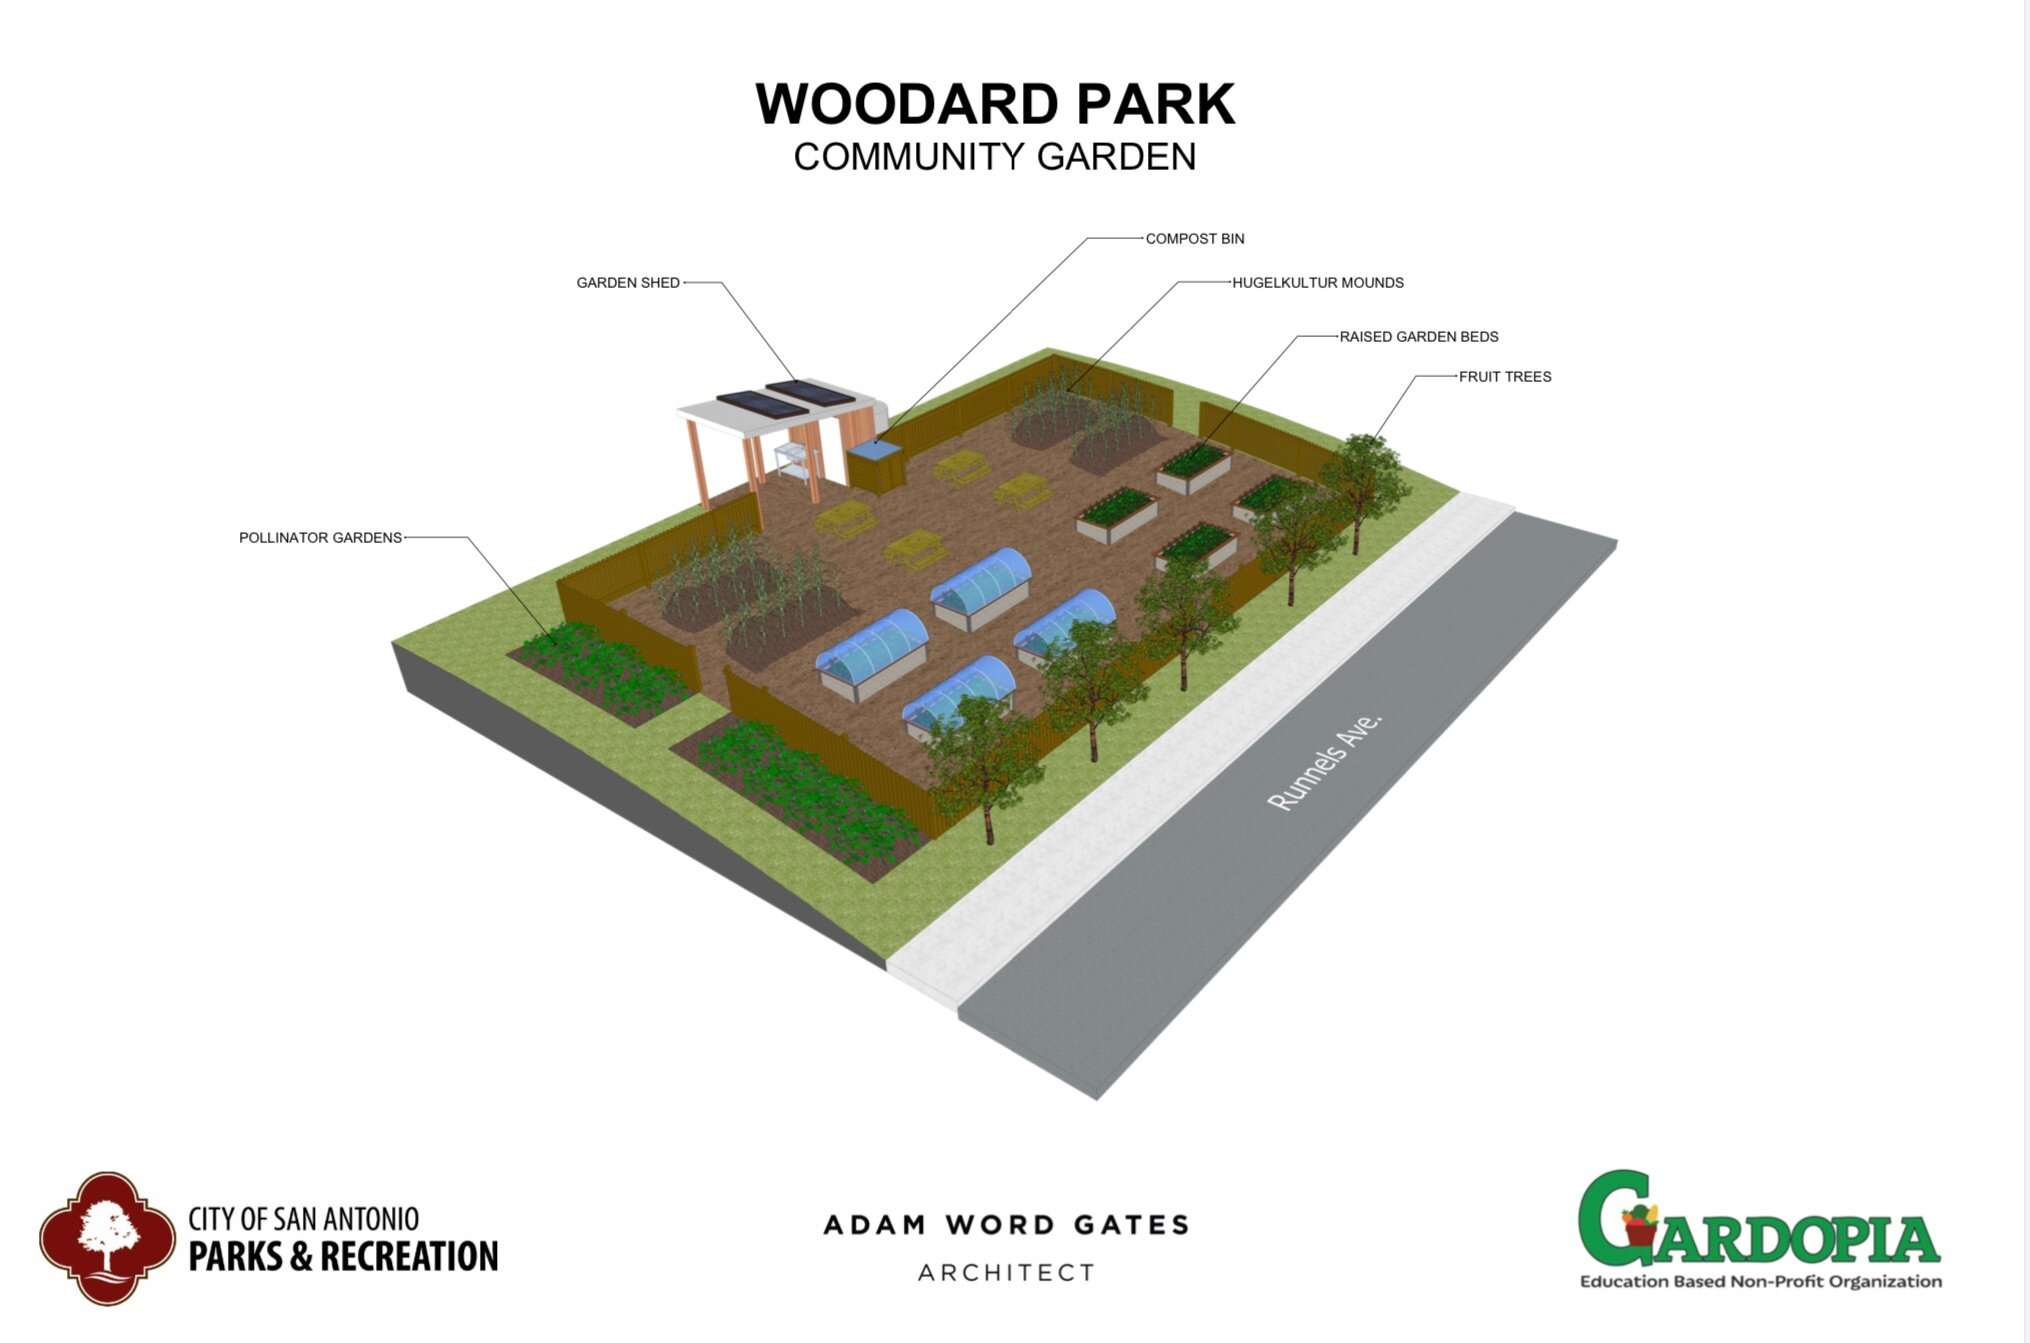 Woodard Park Community Garden Design for the City of San Antonio Parks & Recreation by Adam Word Gates, Architect